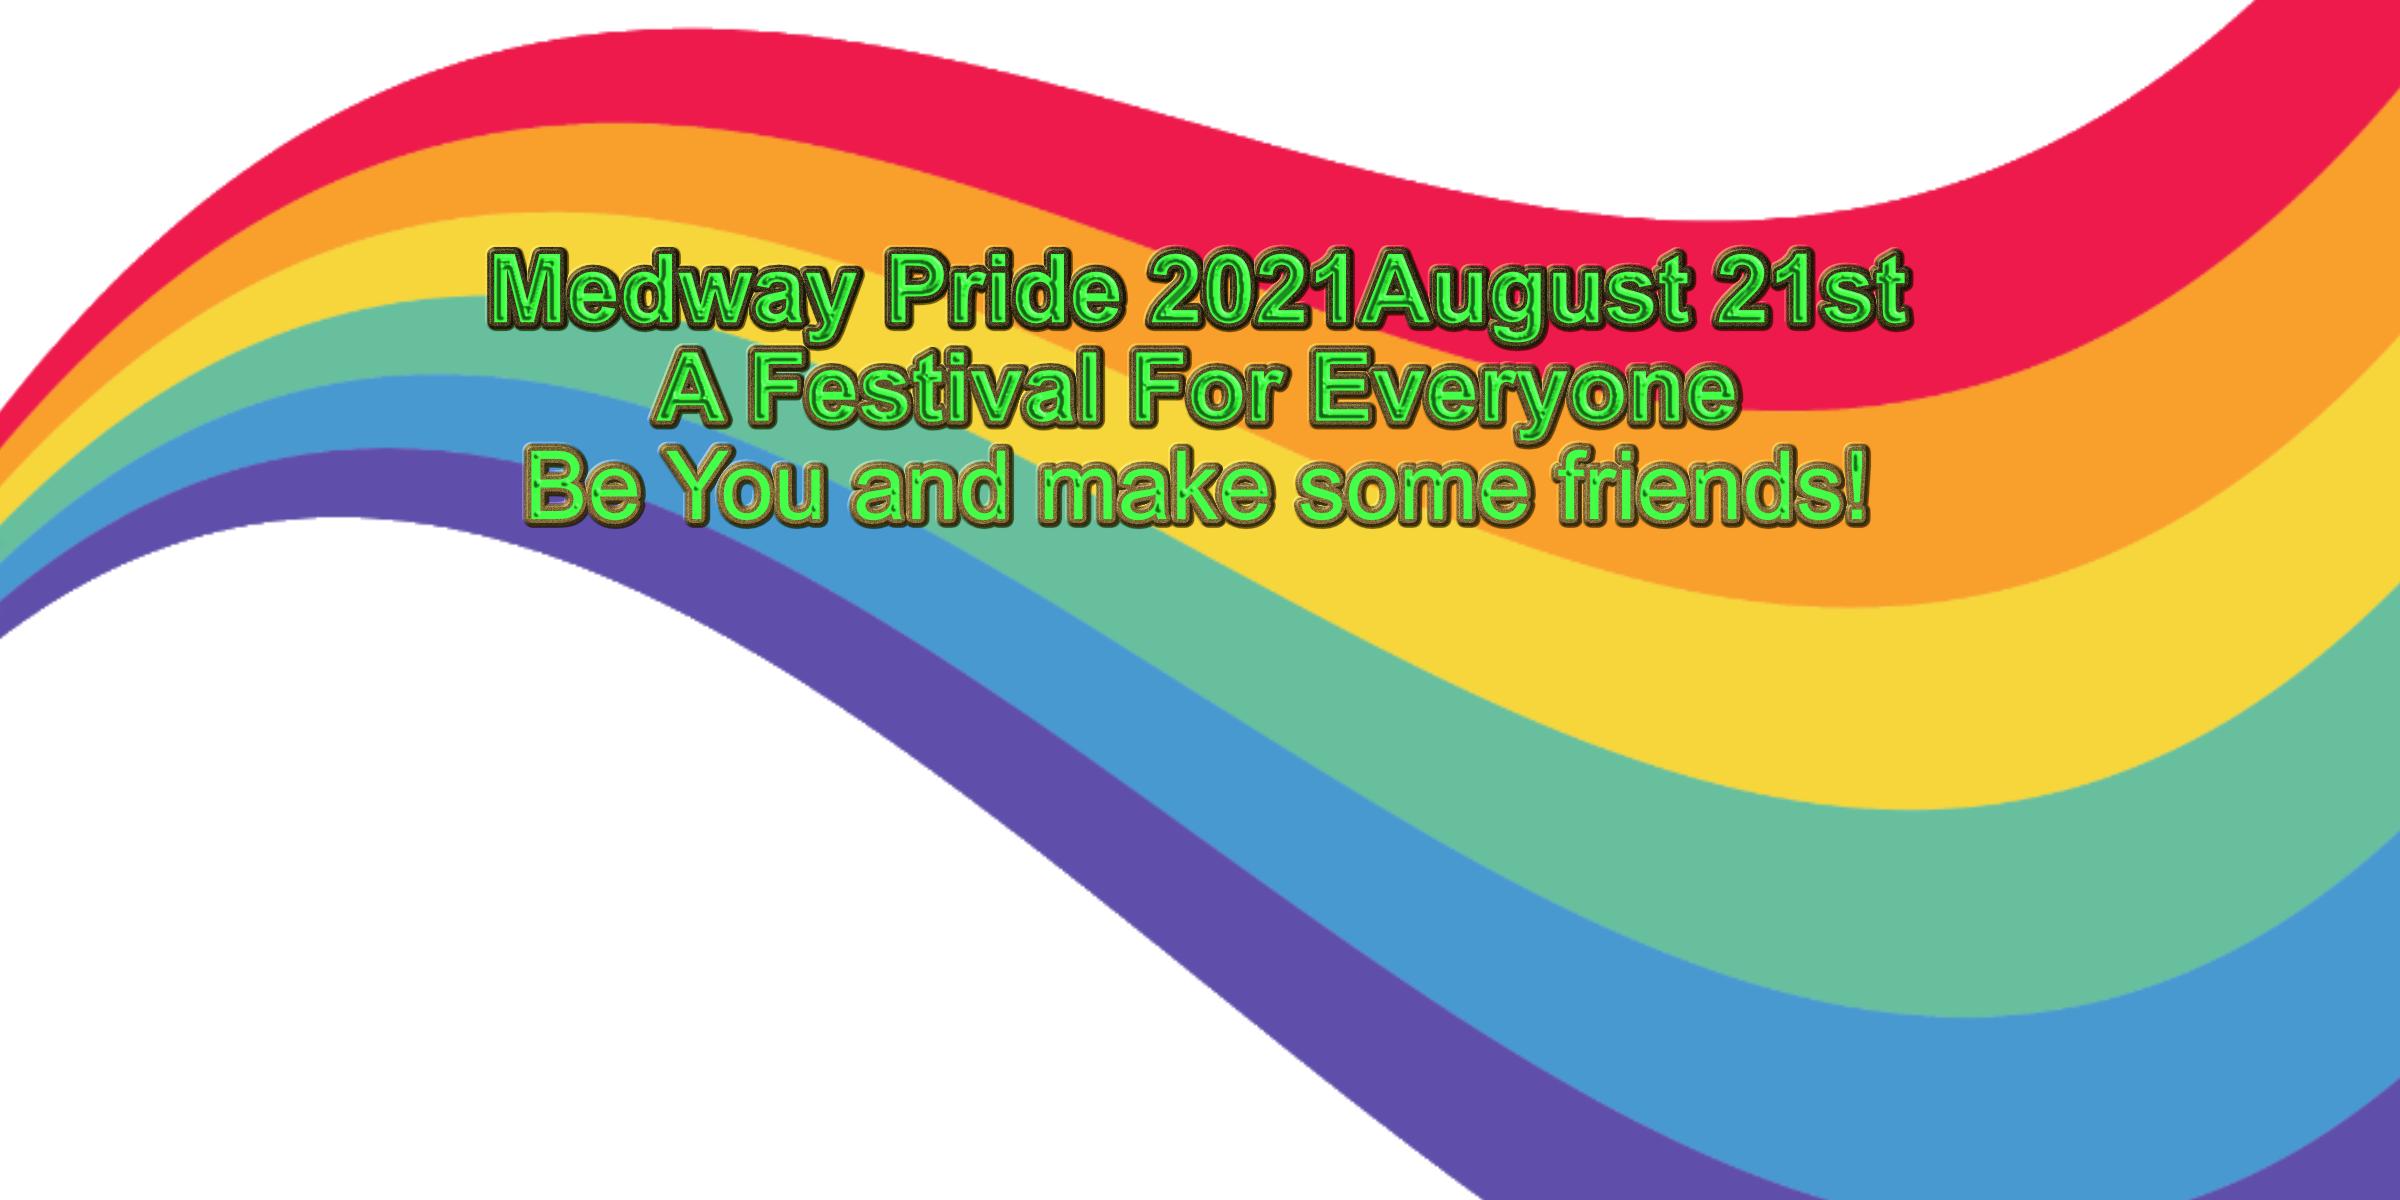 Medway Pride CIC Company number 13428352